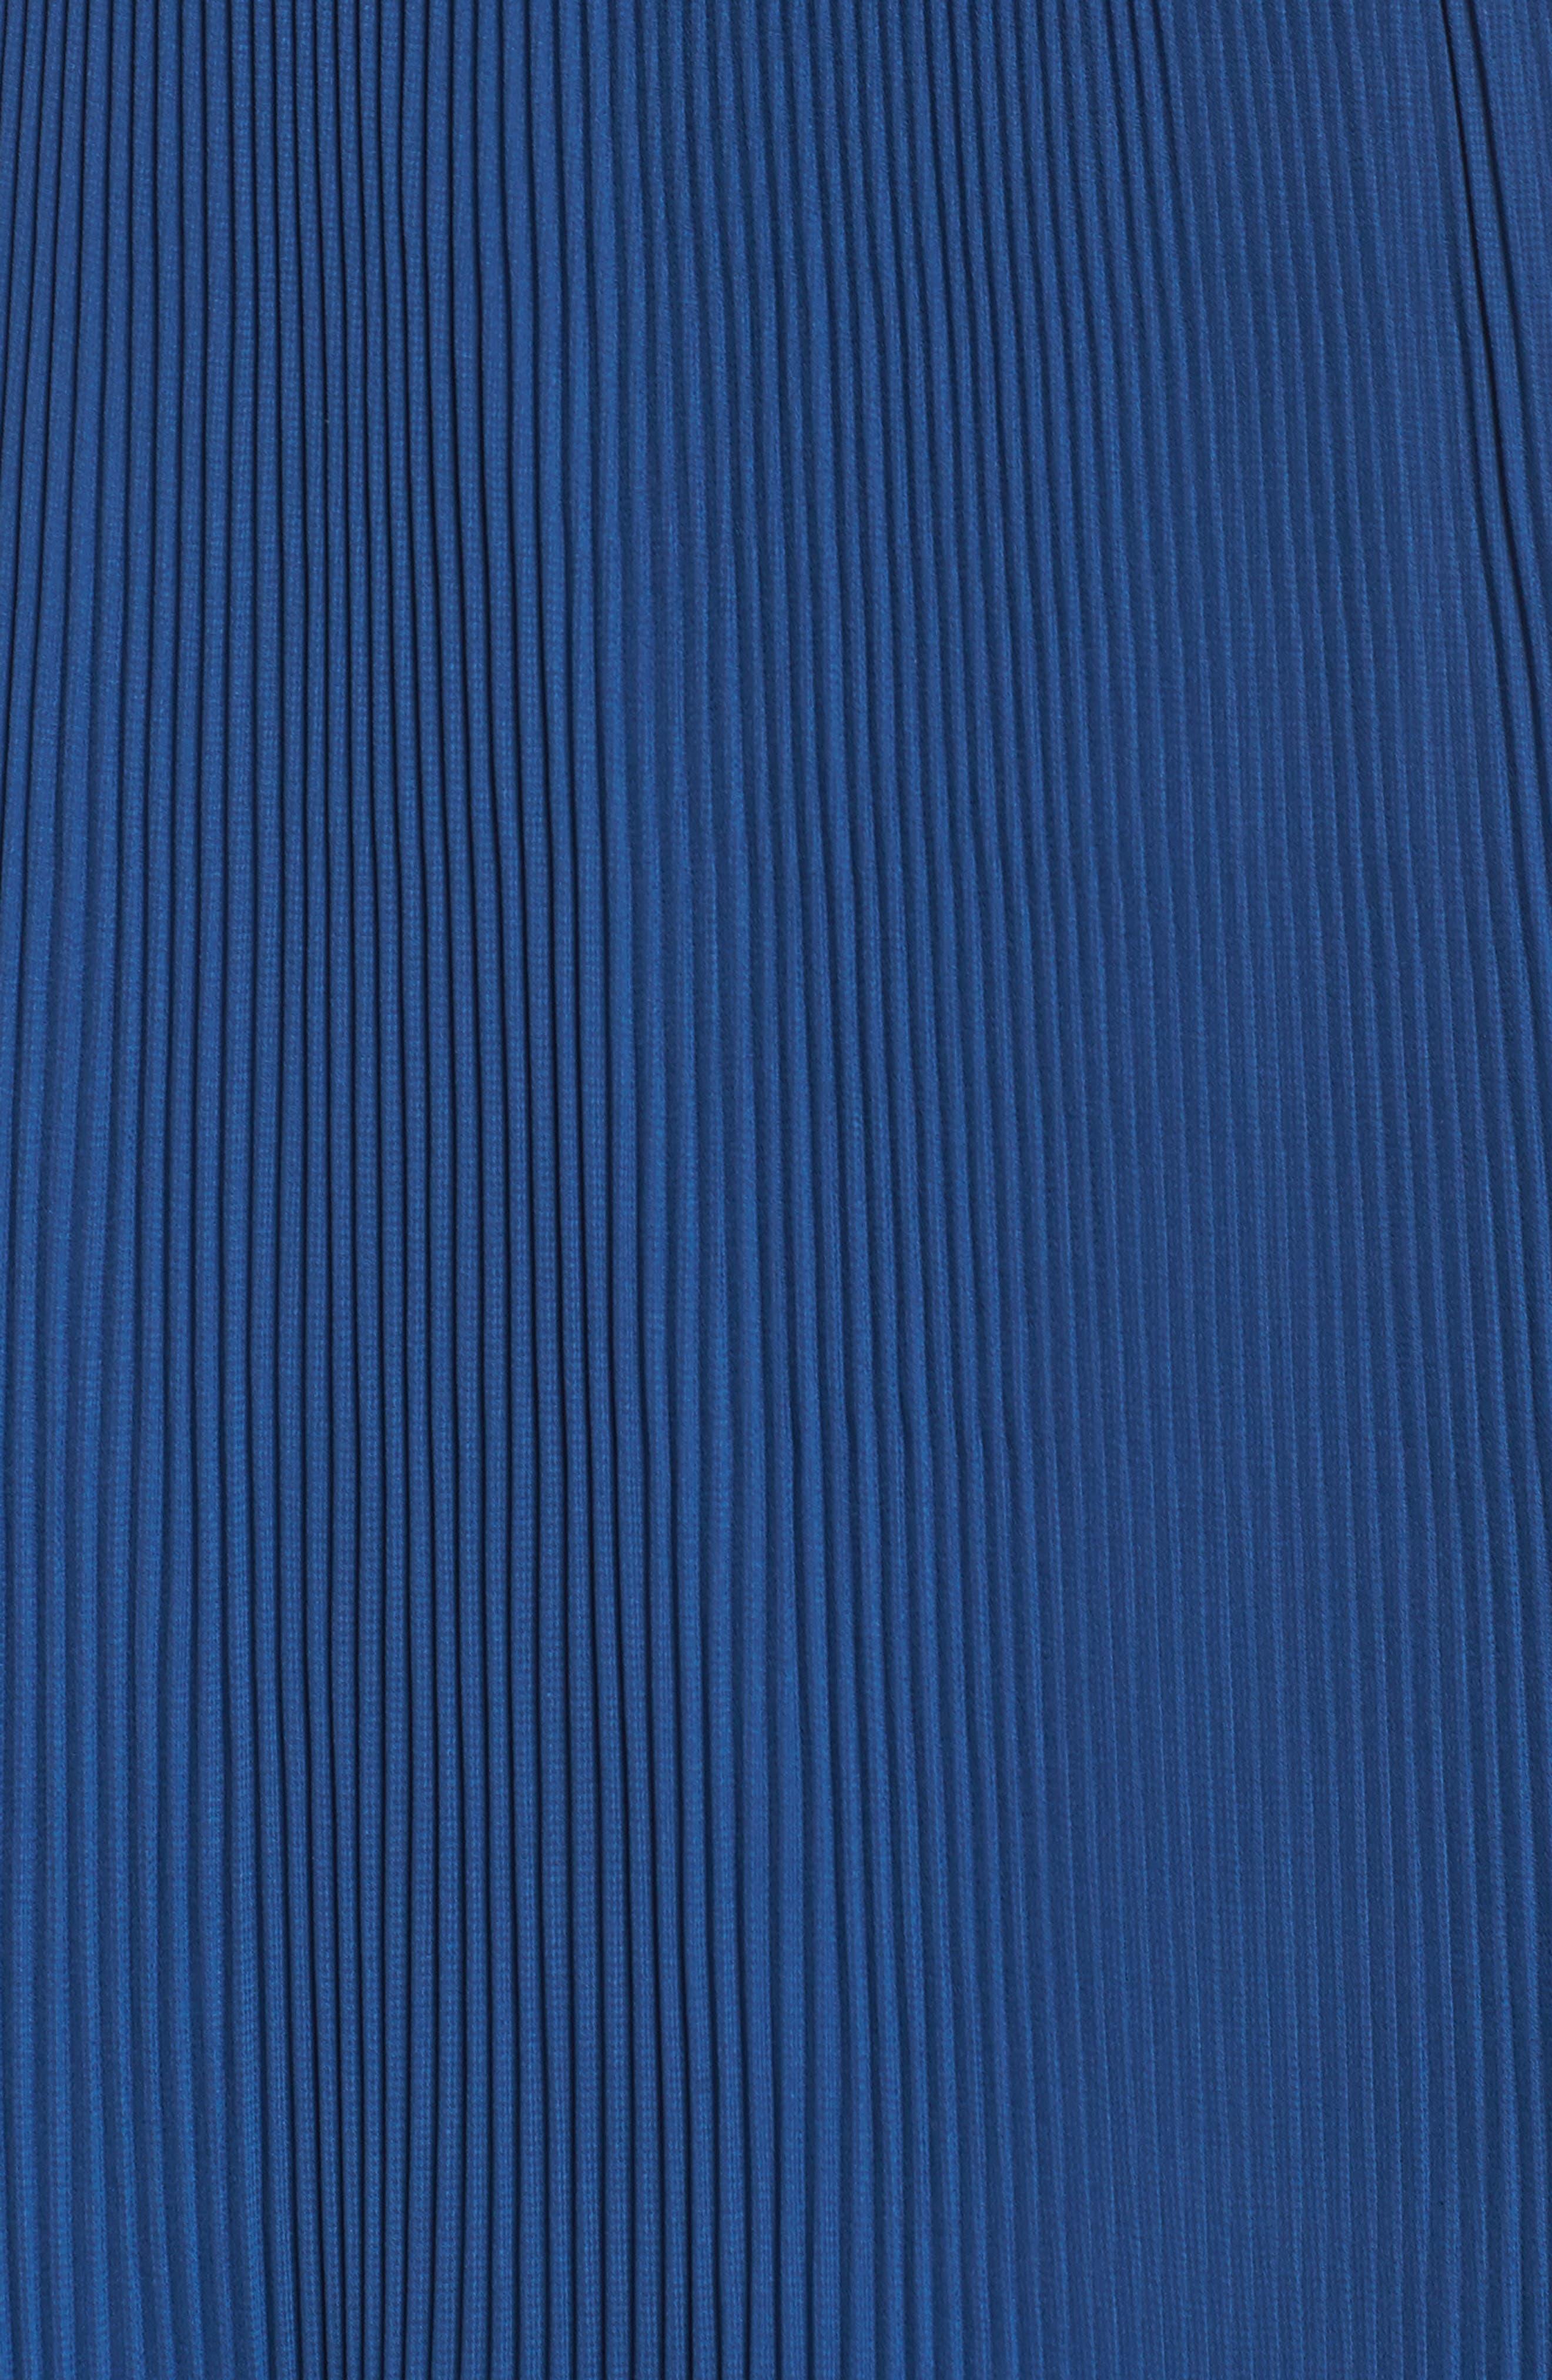 Sunset Blvd Maxi Dress,                             Alternate thumbnail 6, color,                             French Blue